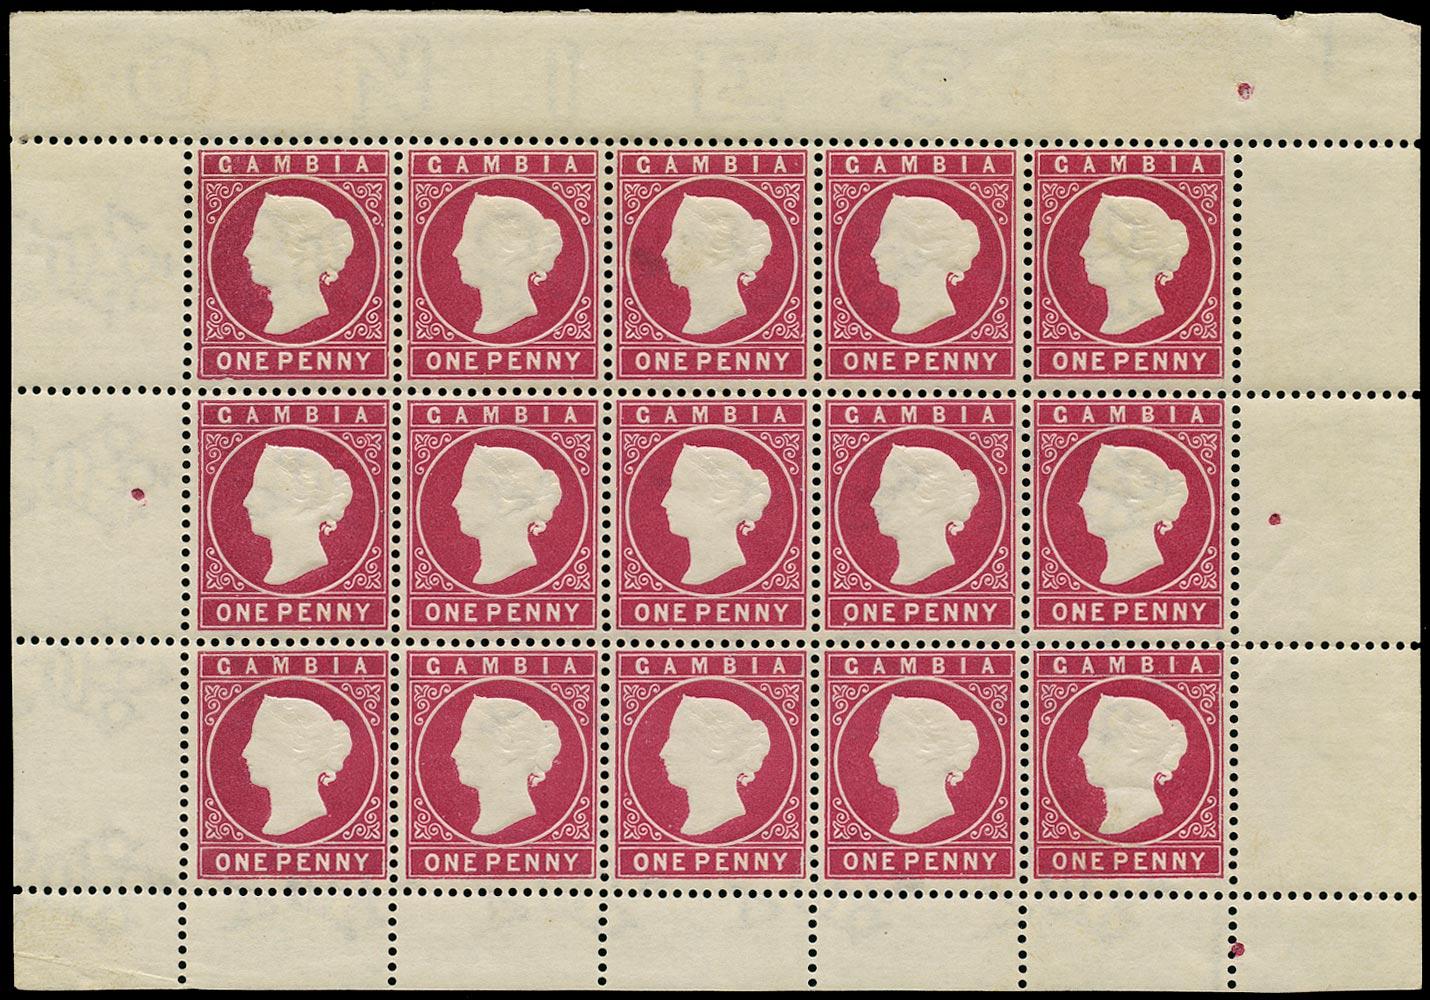 GAMBIA 1886  SG23a Mint 1d aniline crimson watermark CA sideways complete sheet